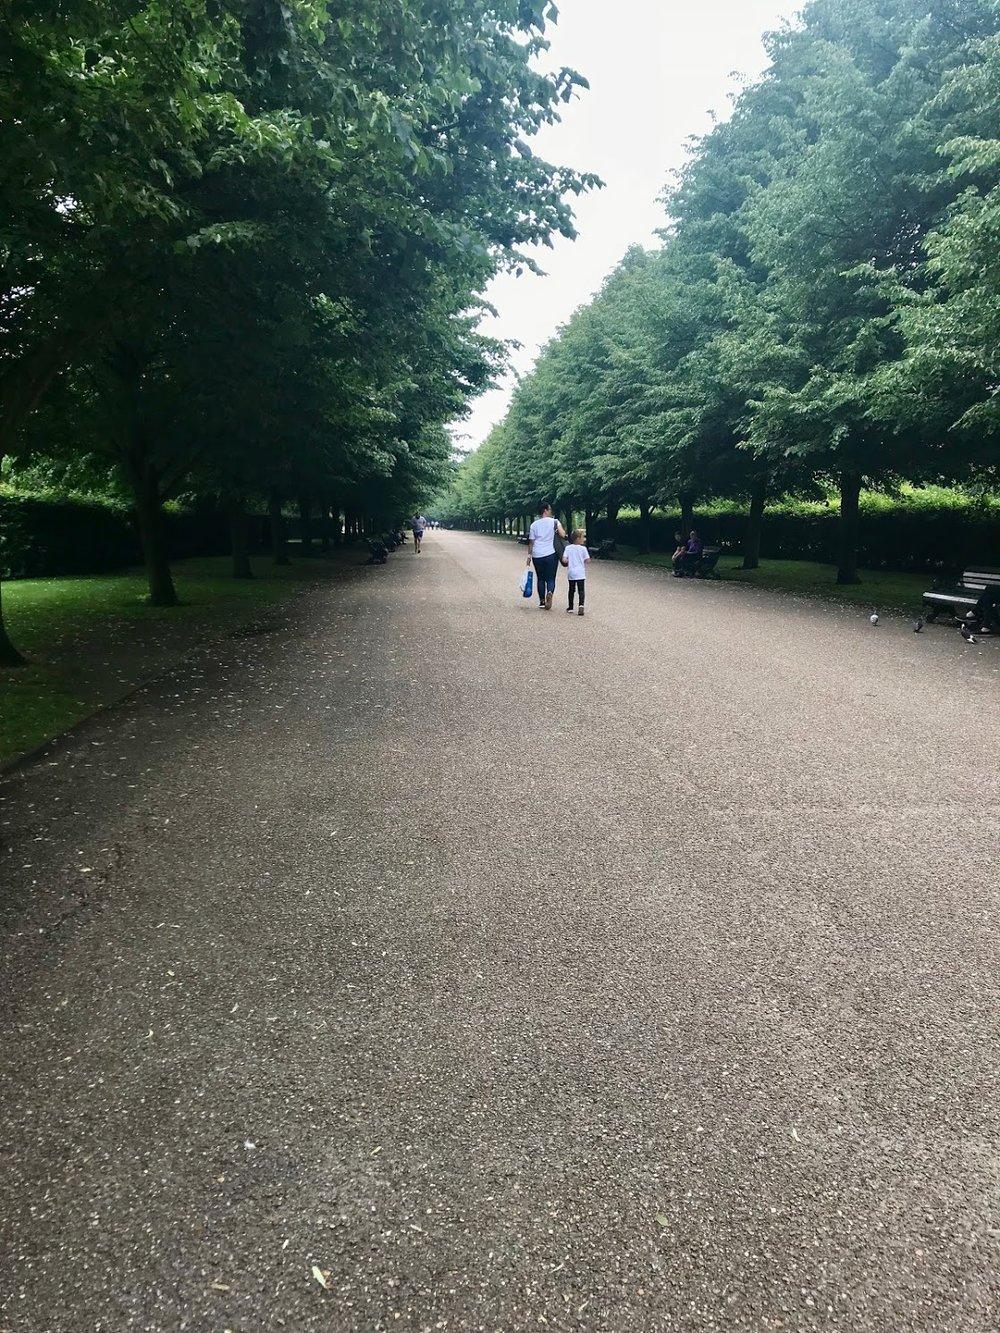 regents park london.jpg